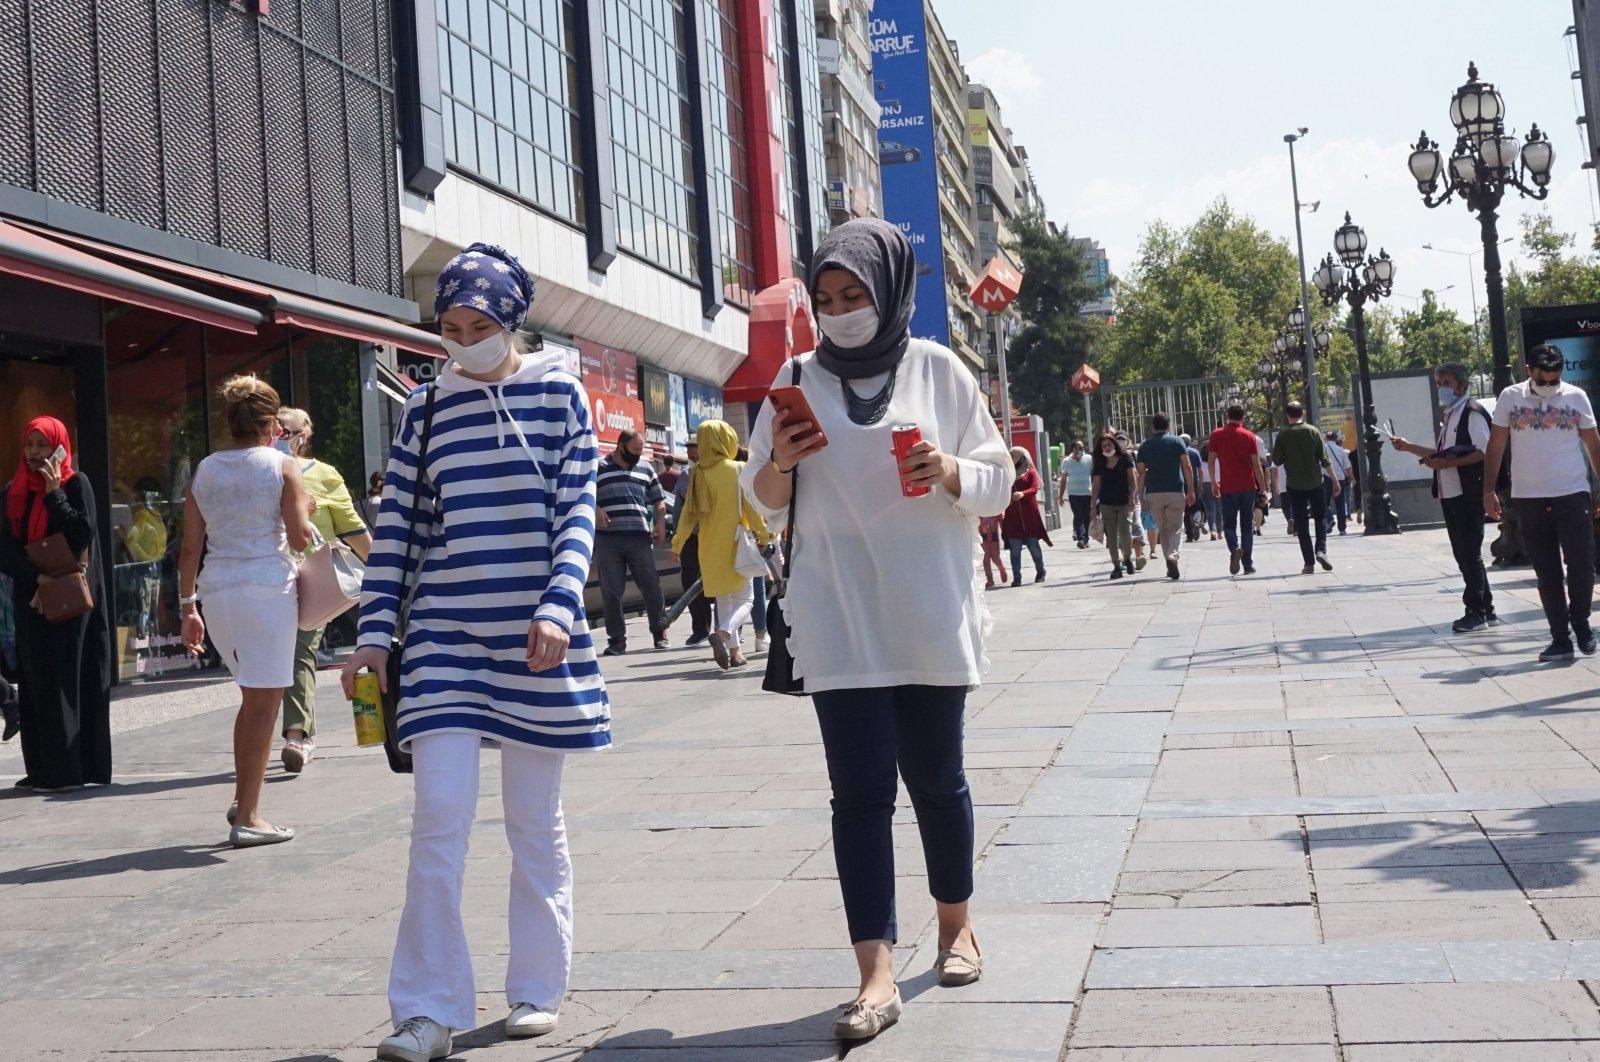 Pedestrians wear face masks as they walk in a street in the capital Ankara, Turkey, Aug. 26, 2020. (AFP Photo)